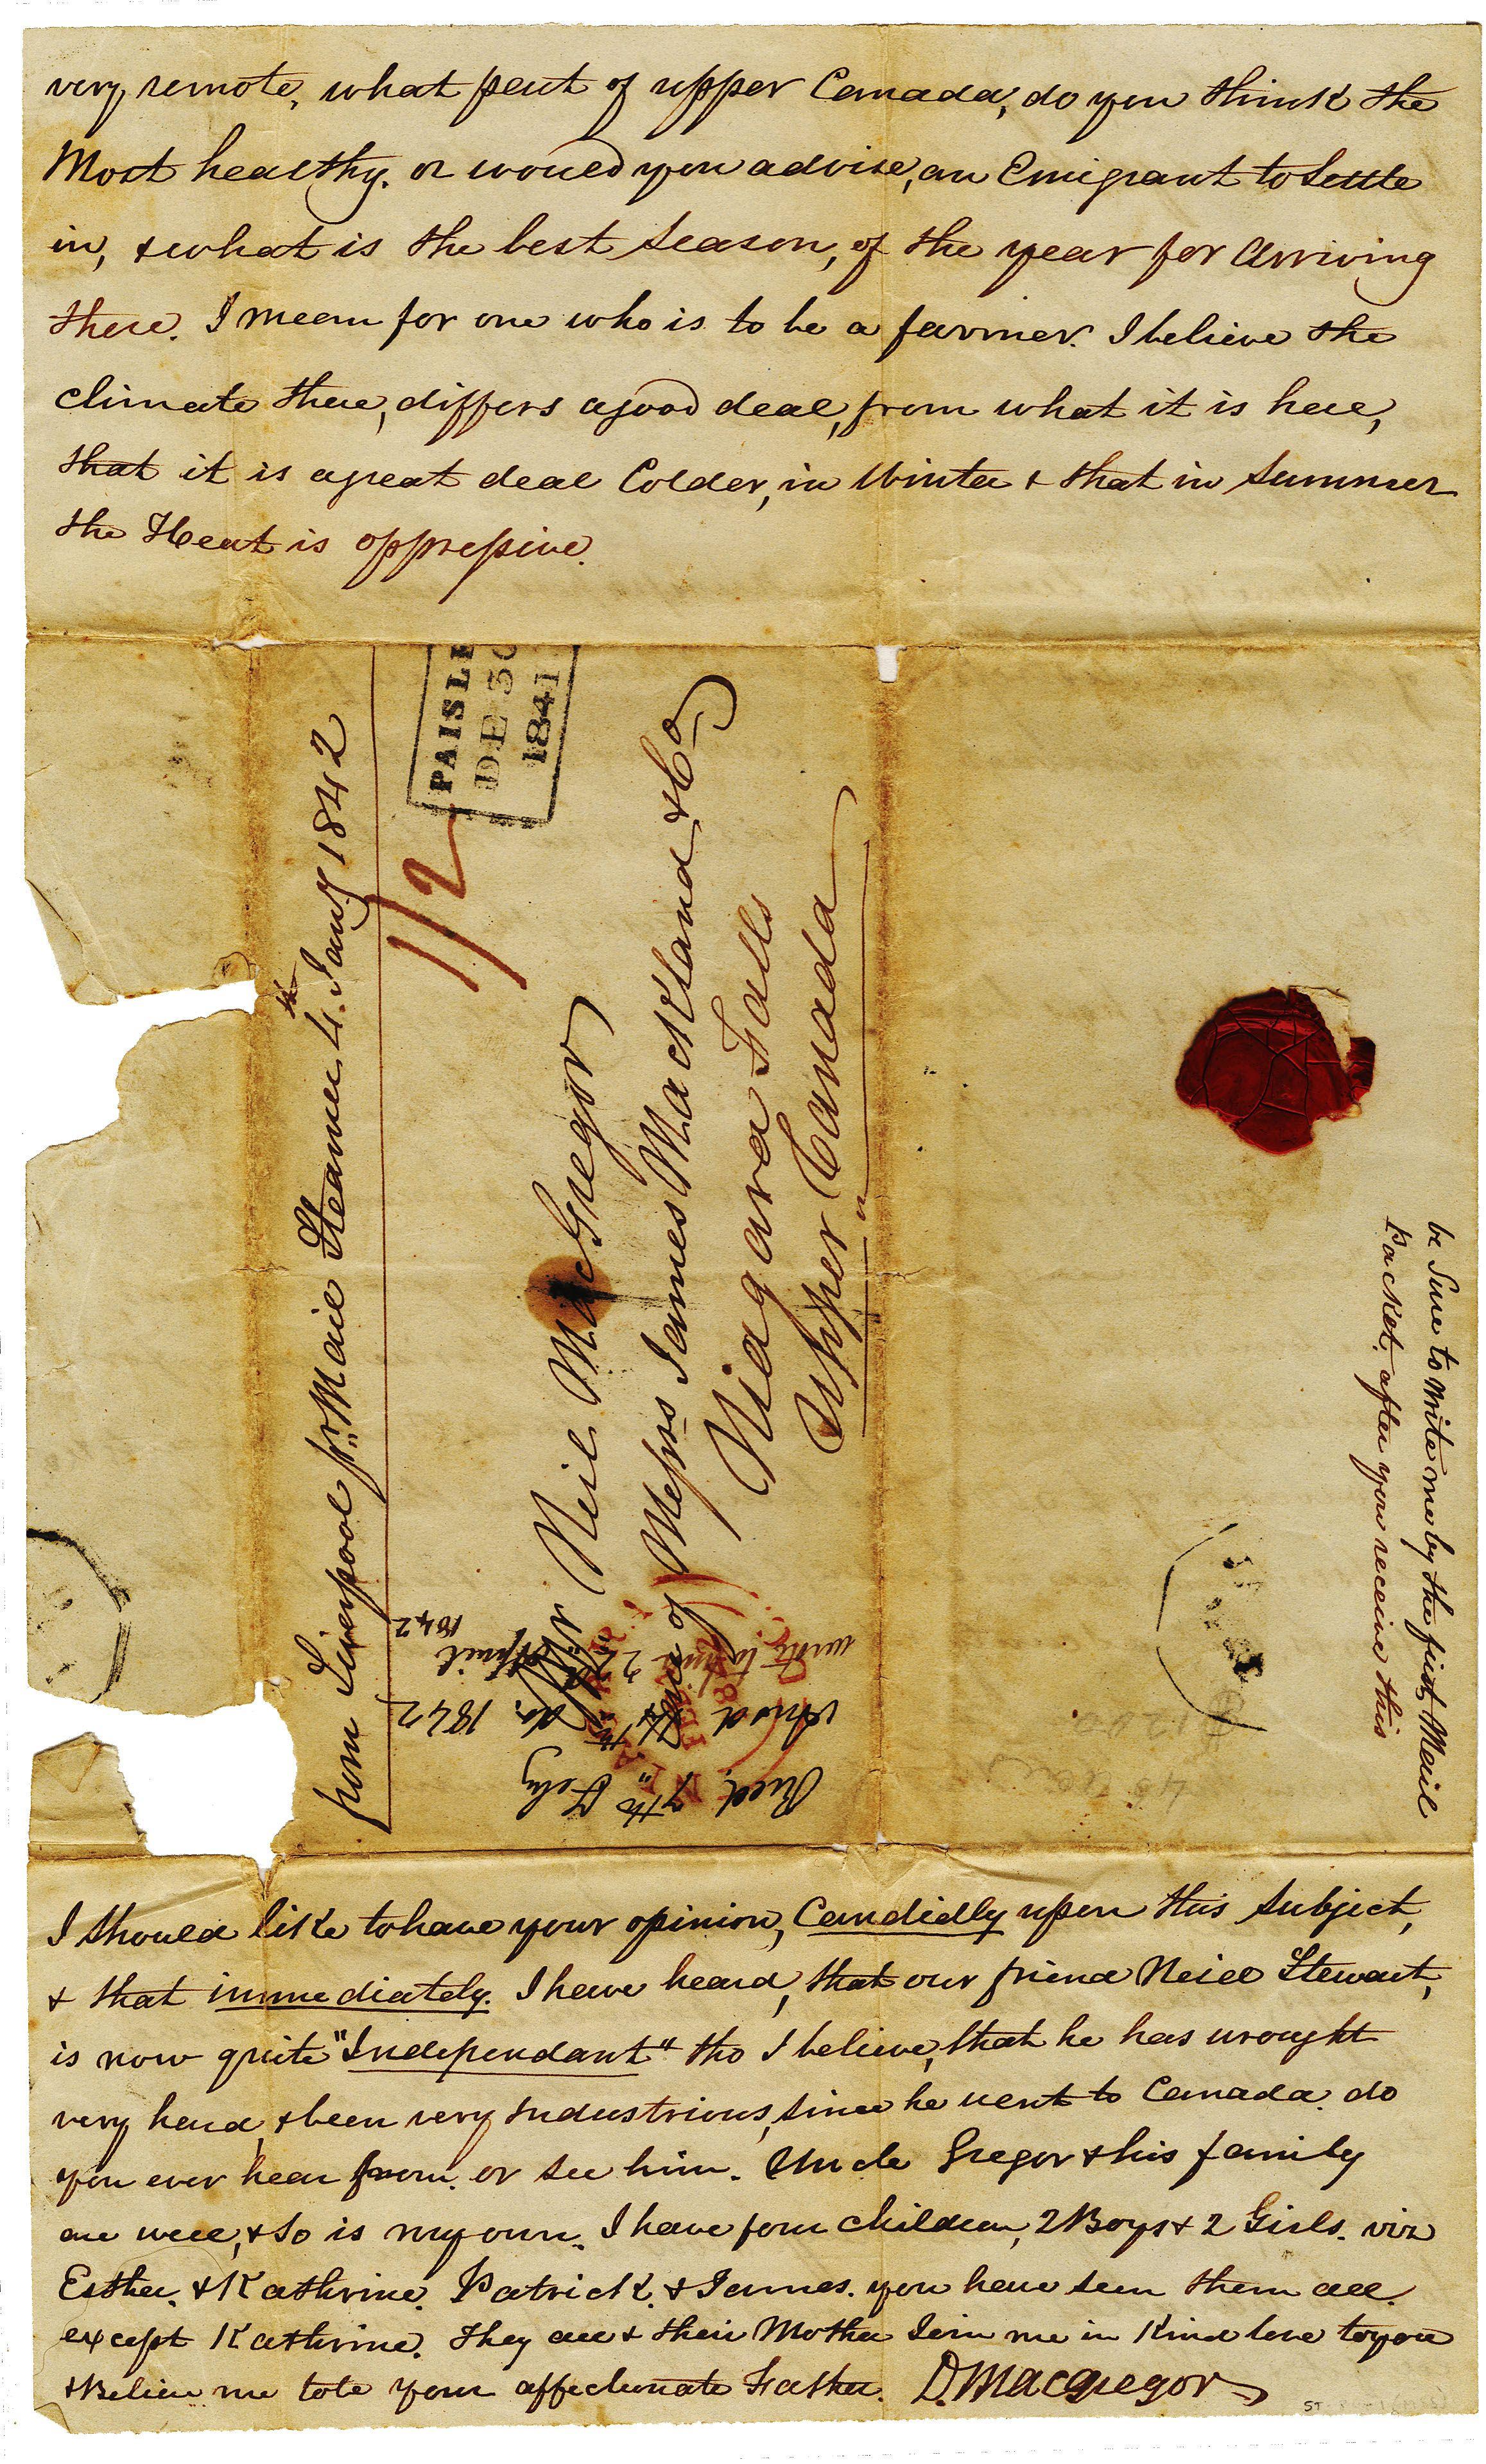 Scrapbook ideas niagara falls - 1841_december 30_pg_4_d_macgregor Old Aged Vintage Worn Letter